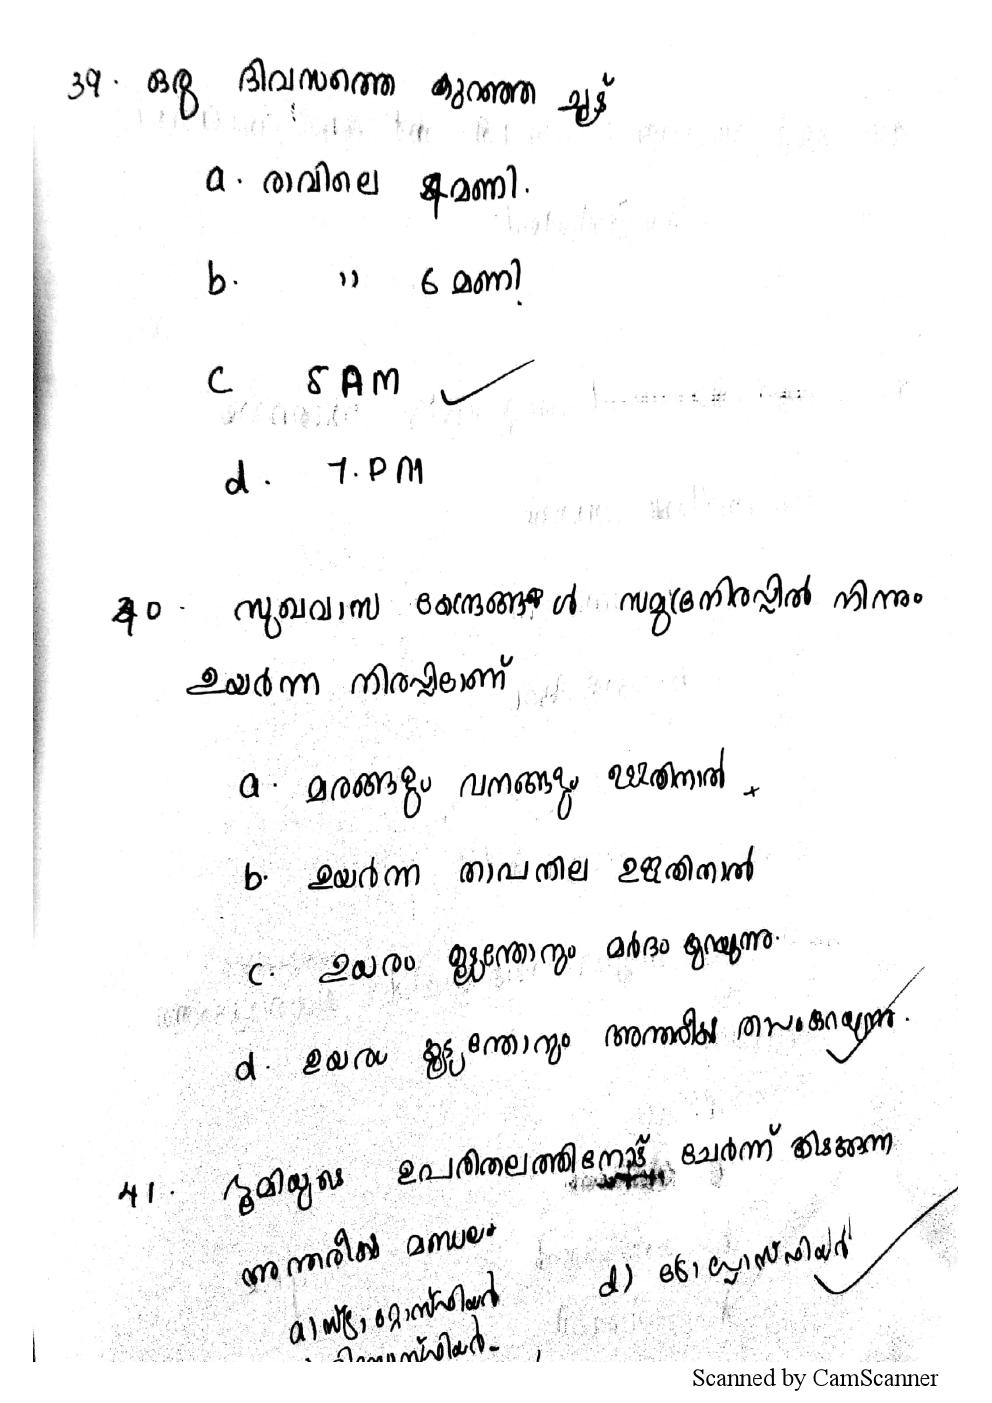 http://masterstudy.net/pdf/ktet_notes0060.png